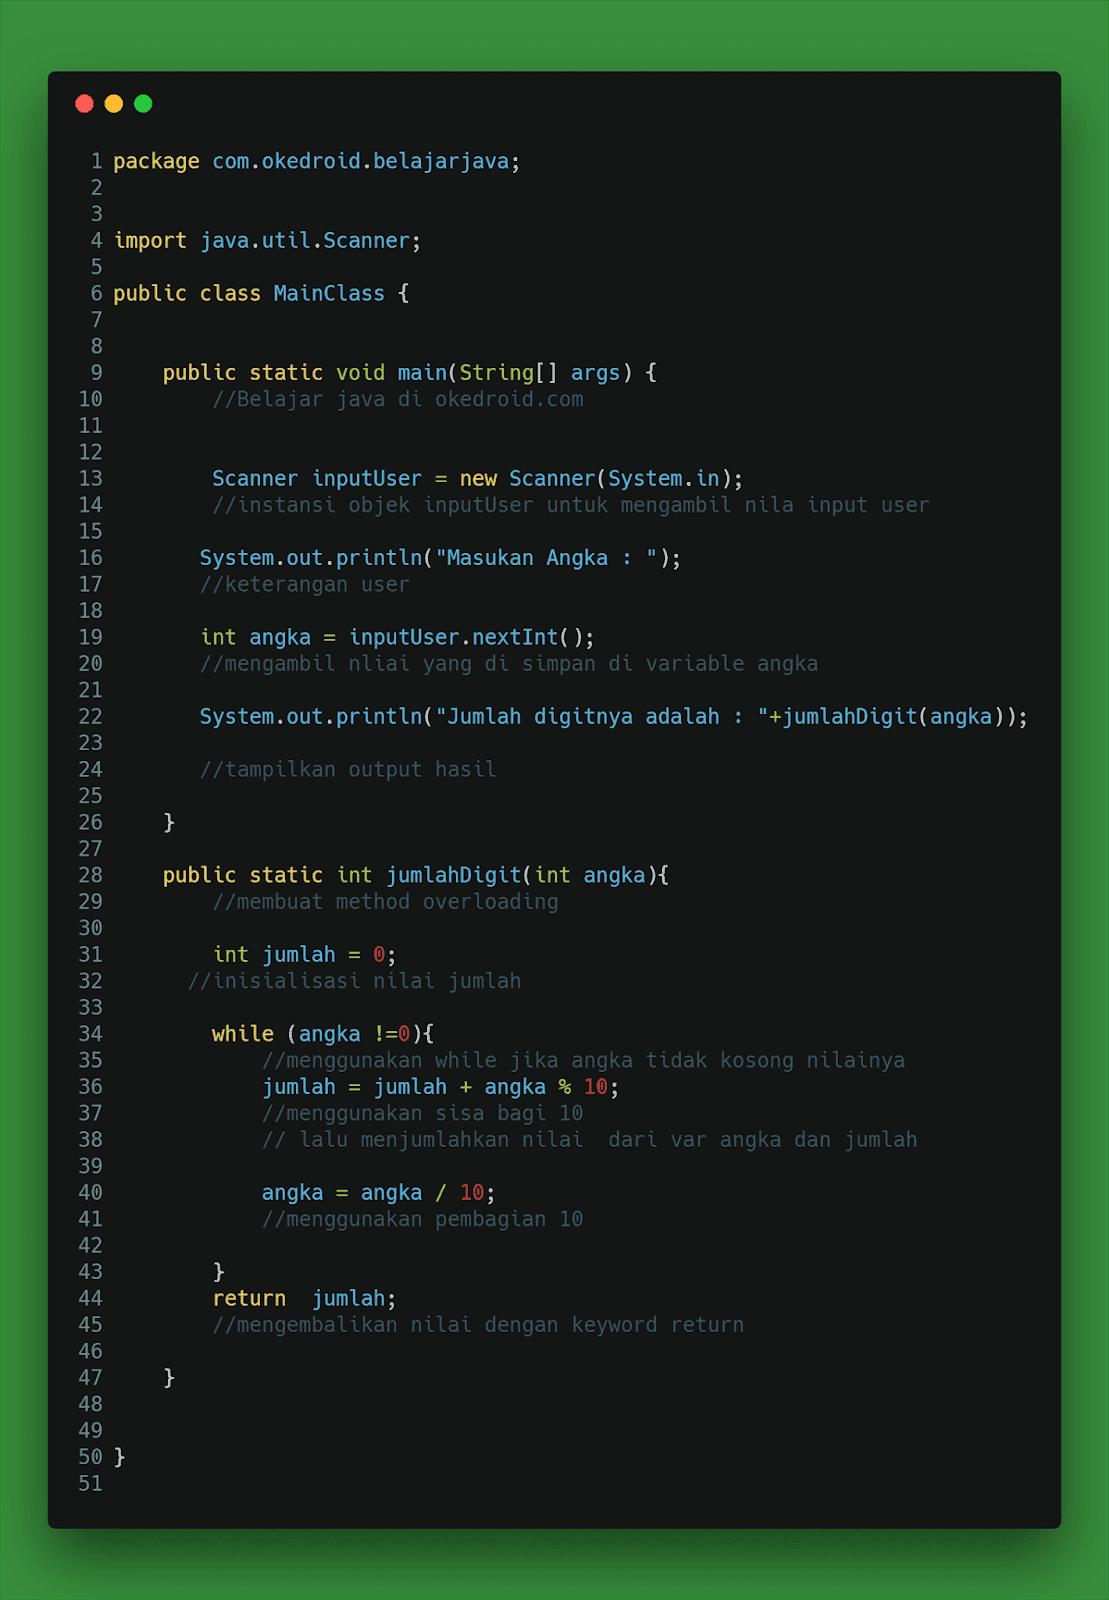 Contoh Code Program Menghitung Jumlah Digit Angka Integer di Java